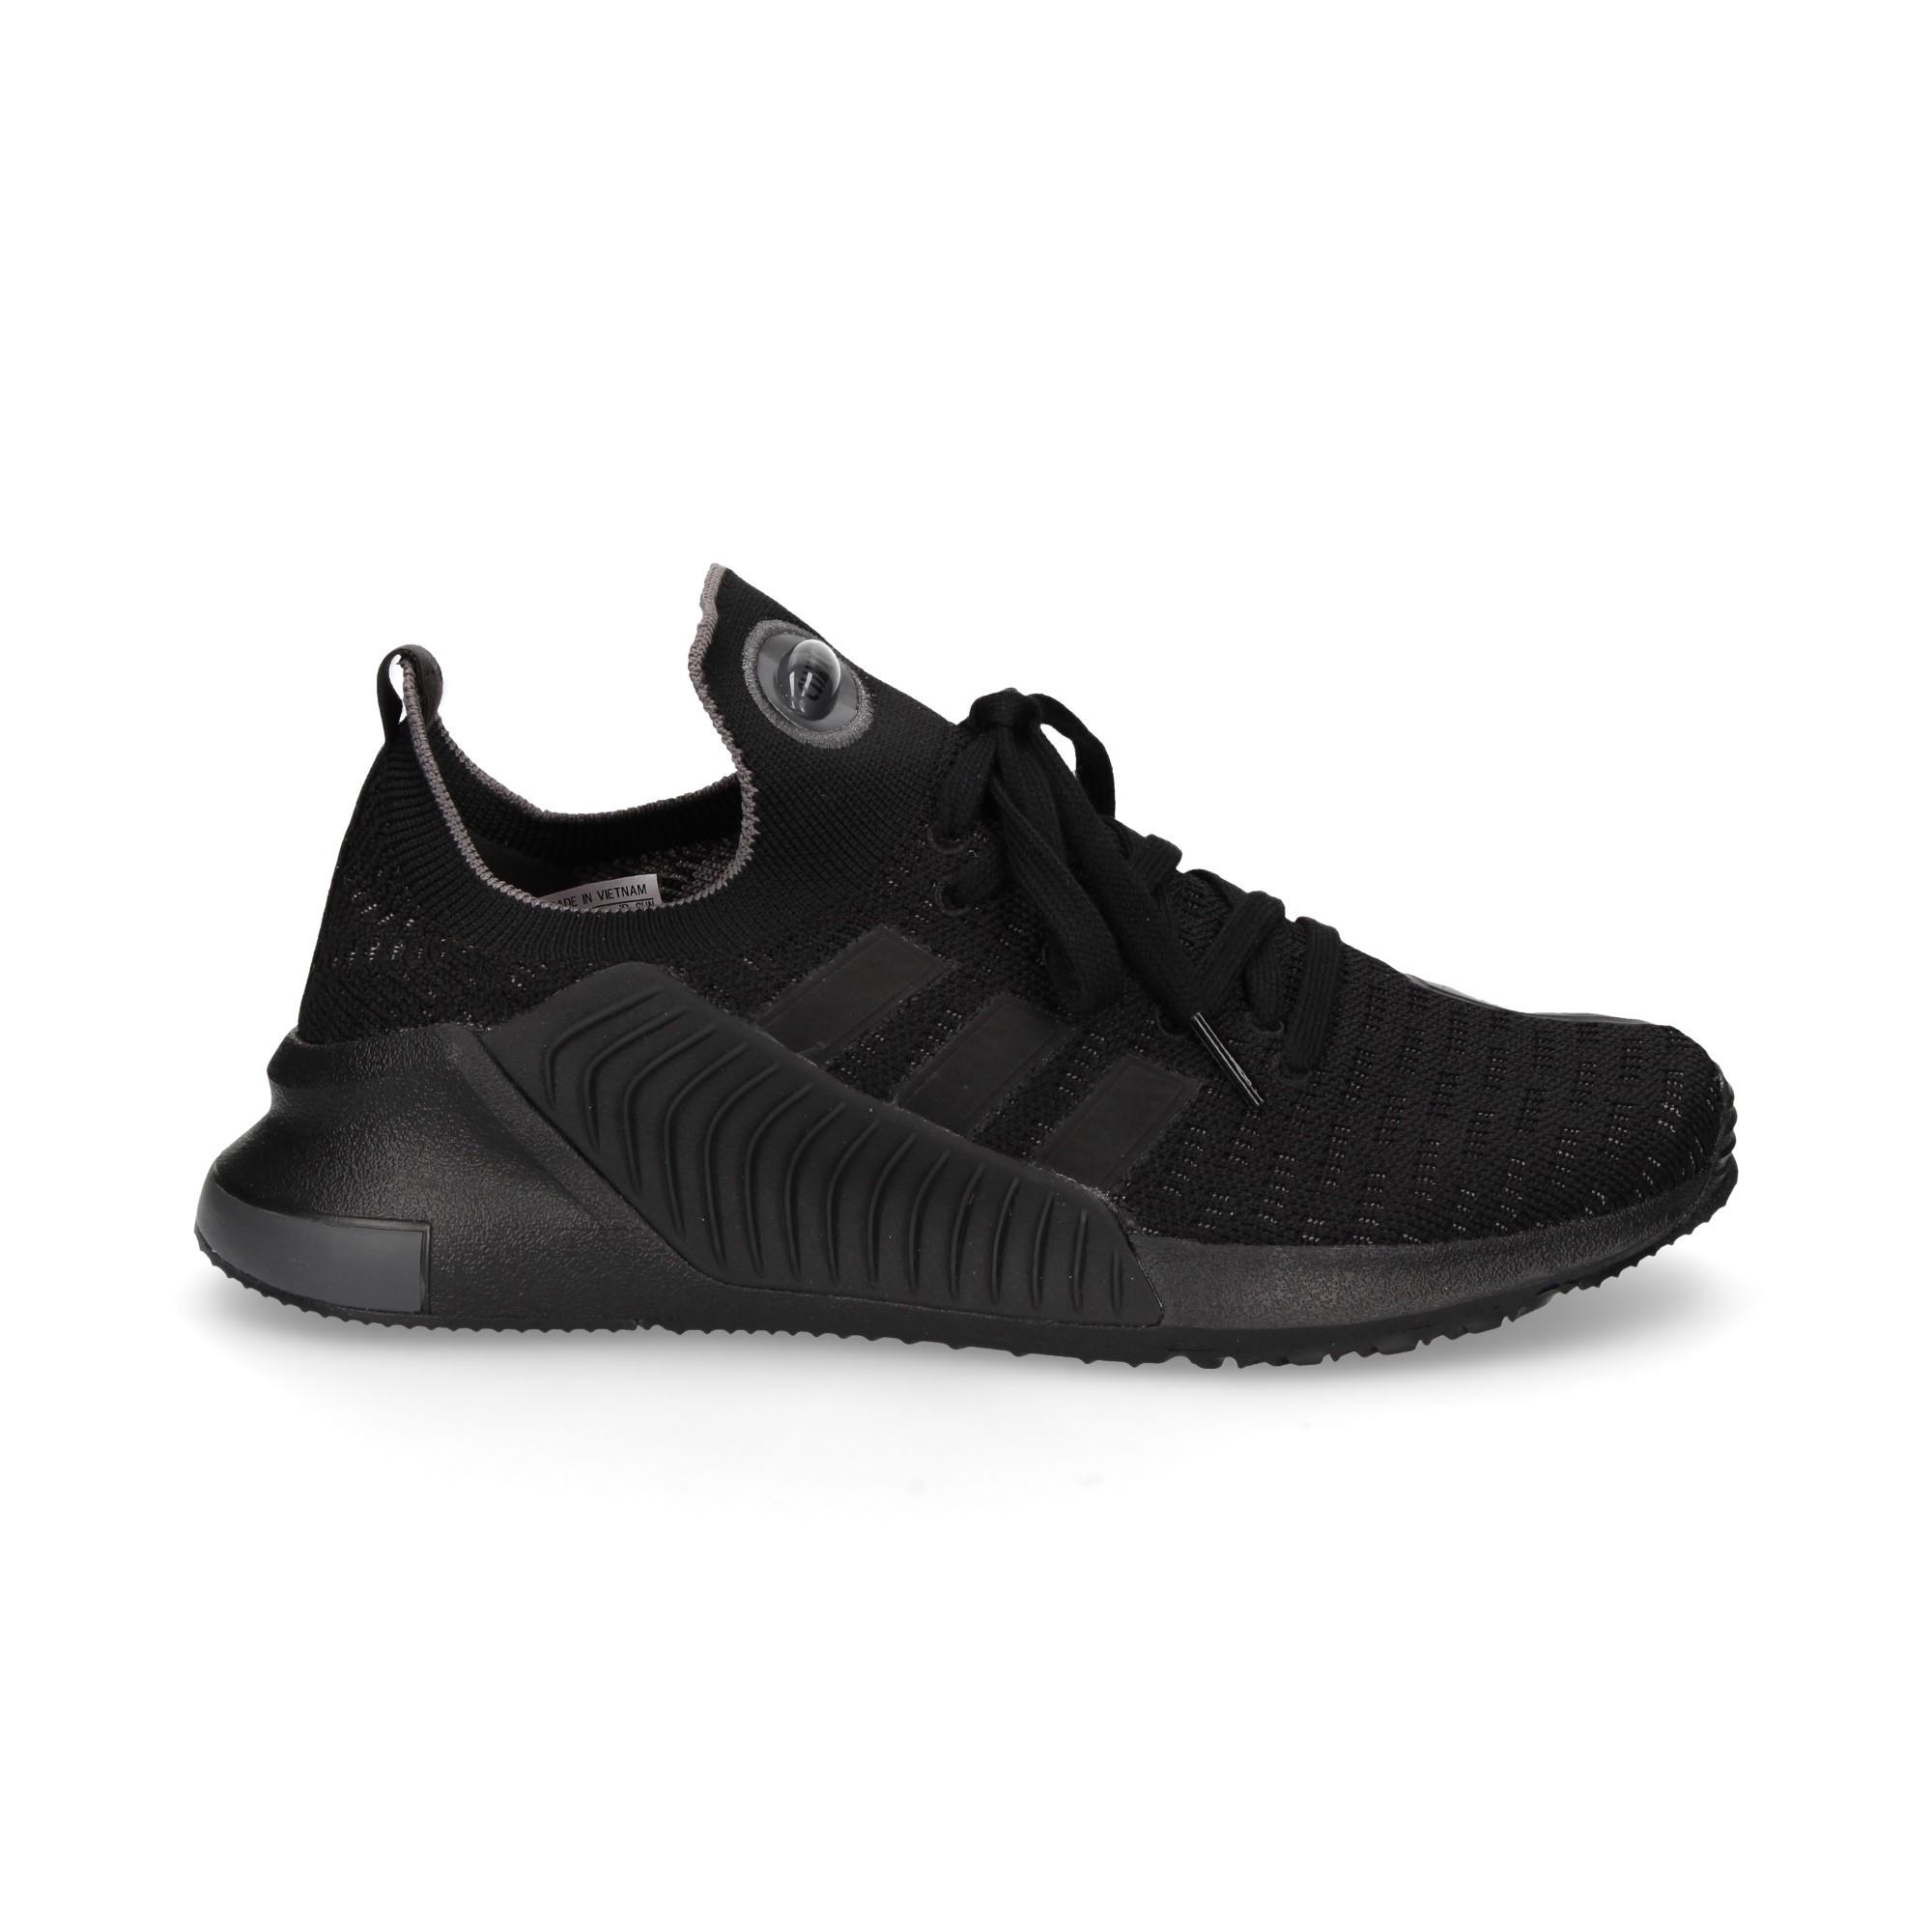 3-bandas-calcetin-textil-negro